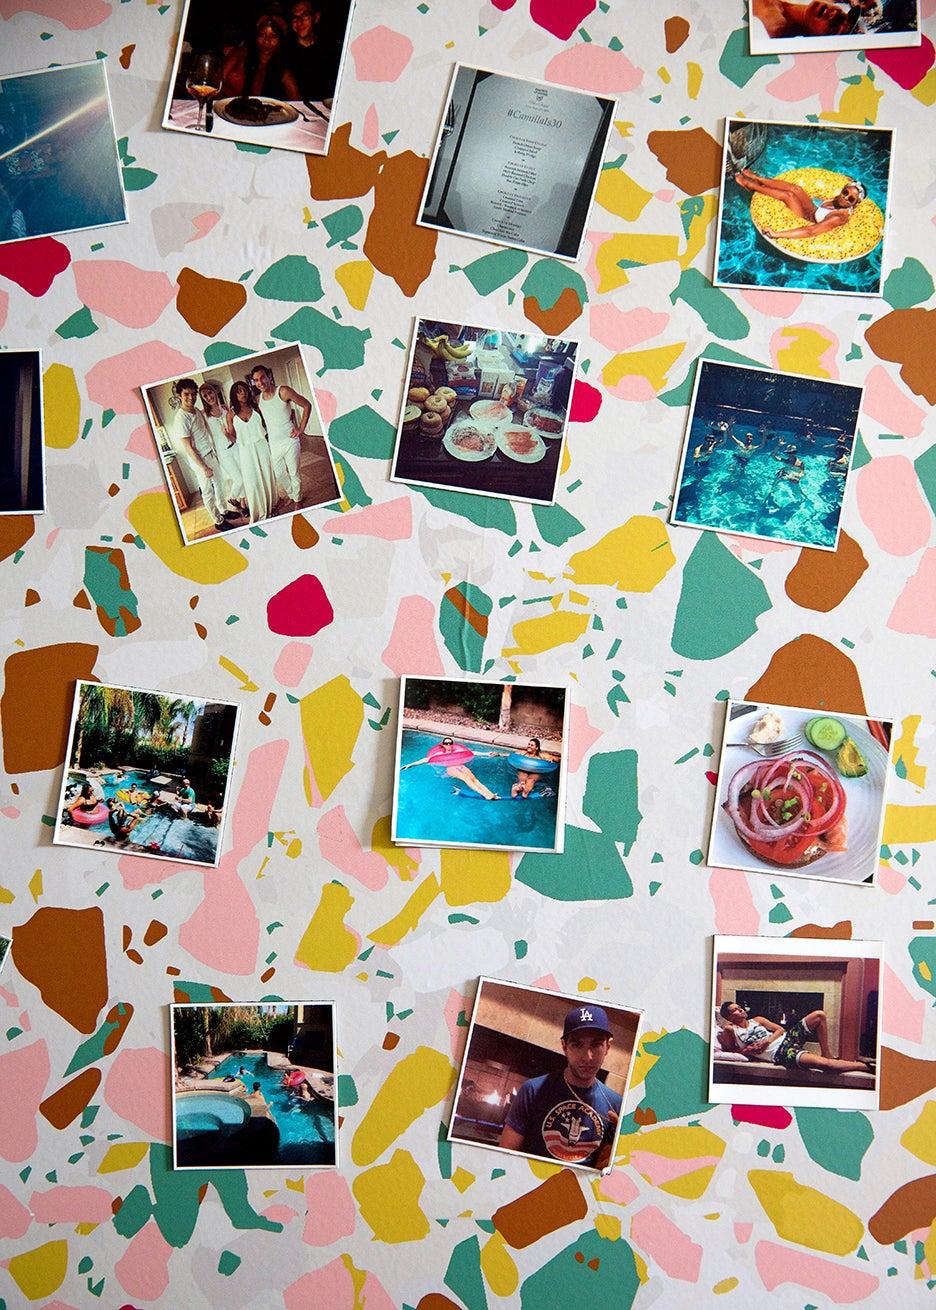 photos taped to fridge